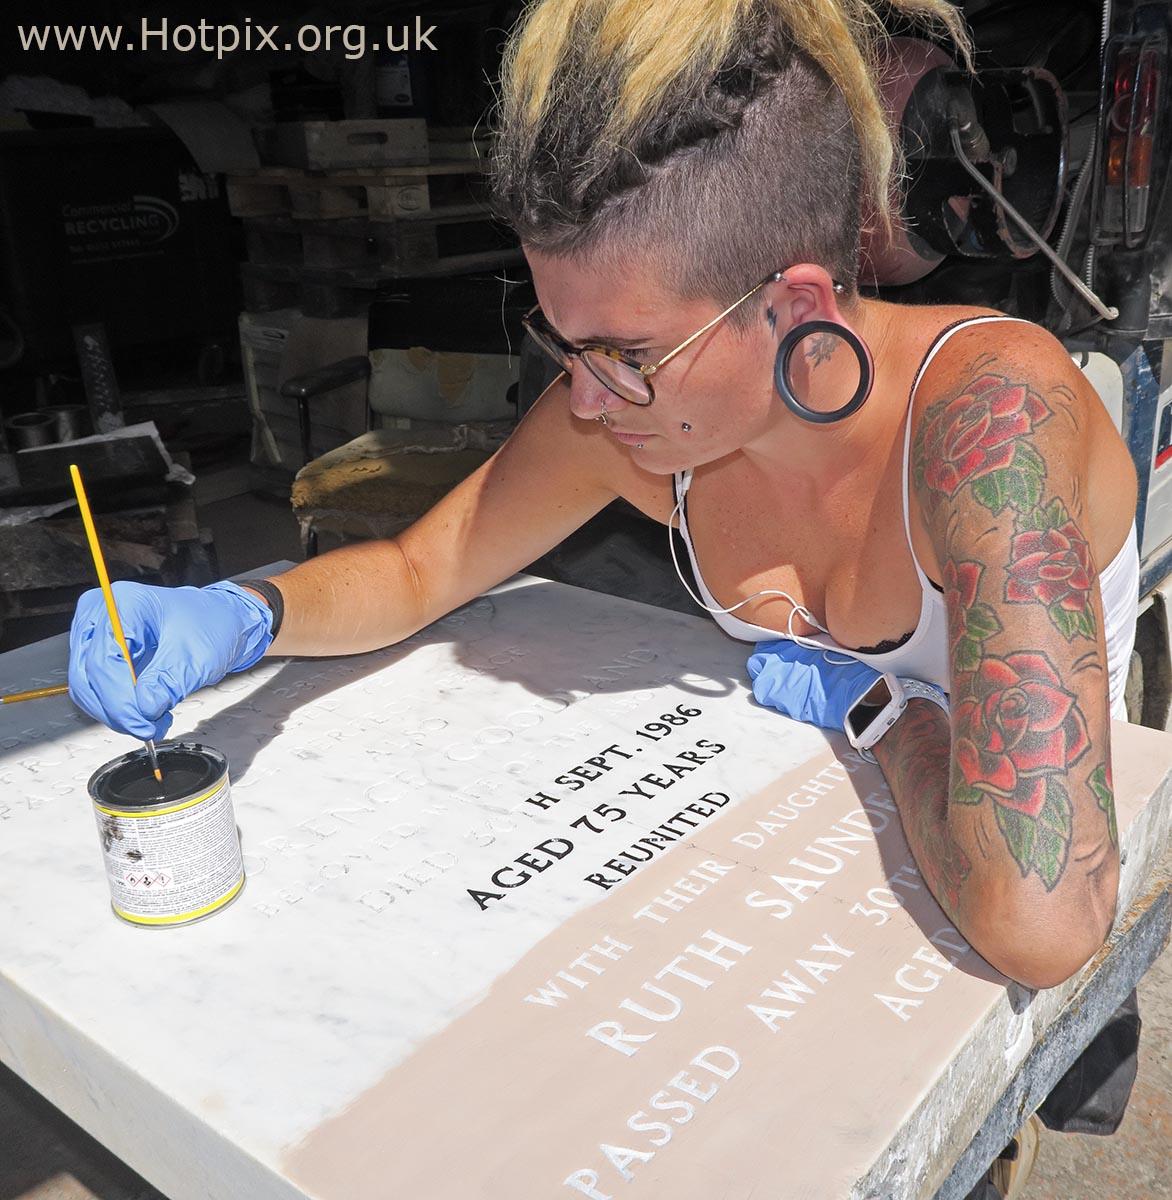 GoTonySmith,HotpixUK,Hotpix,Tony Smith,HousingITguy,365,Project365,2nd 365,HotpixUK365,lady,female,woman,gravestone,Bridgwater,Somerset,England,Artist,tats,tattoo,tattoos,paint,painting,mason,masons